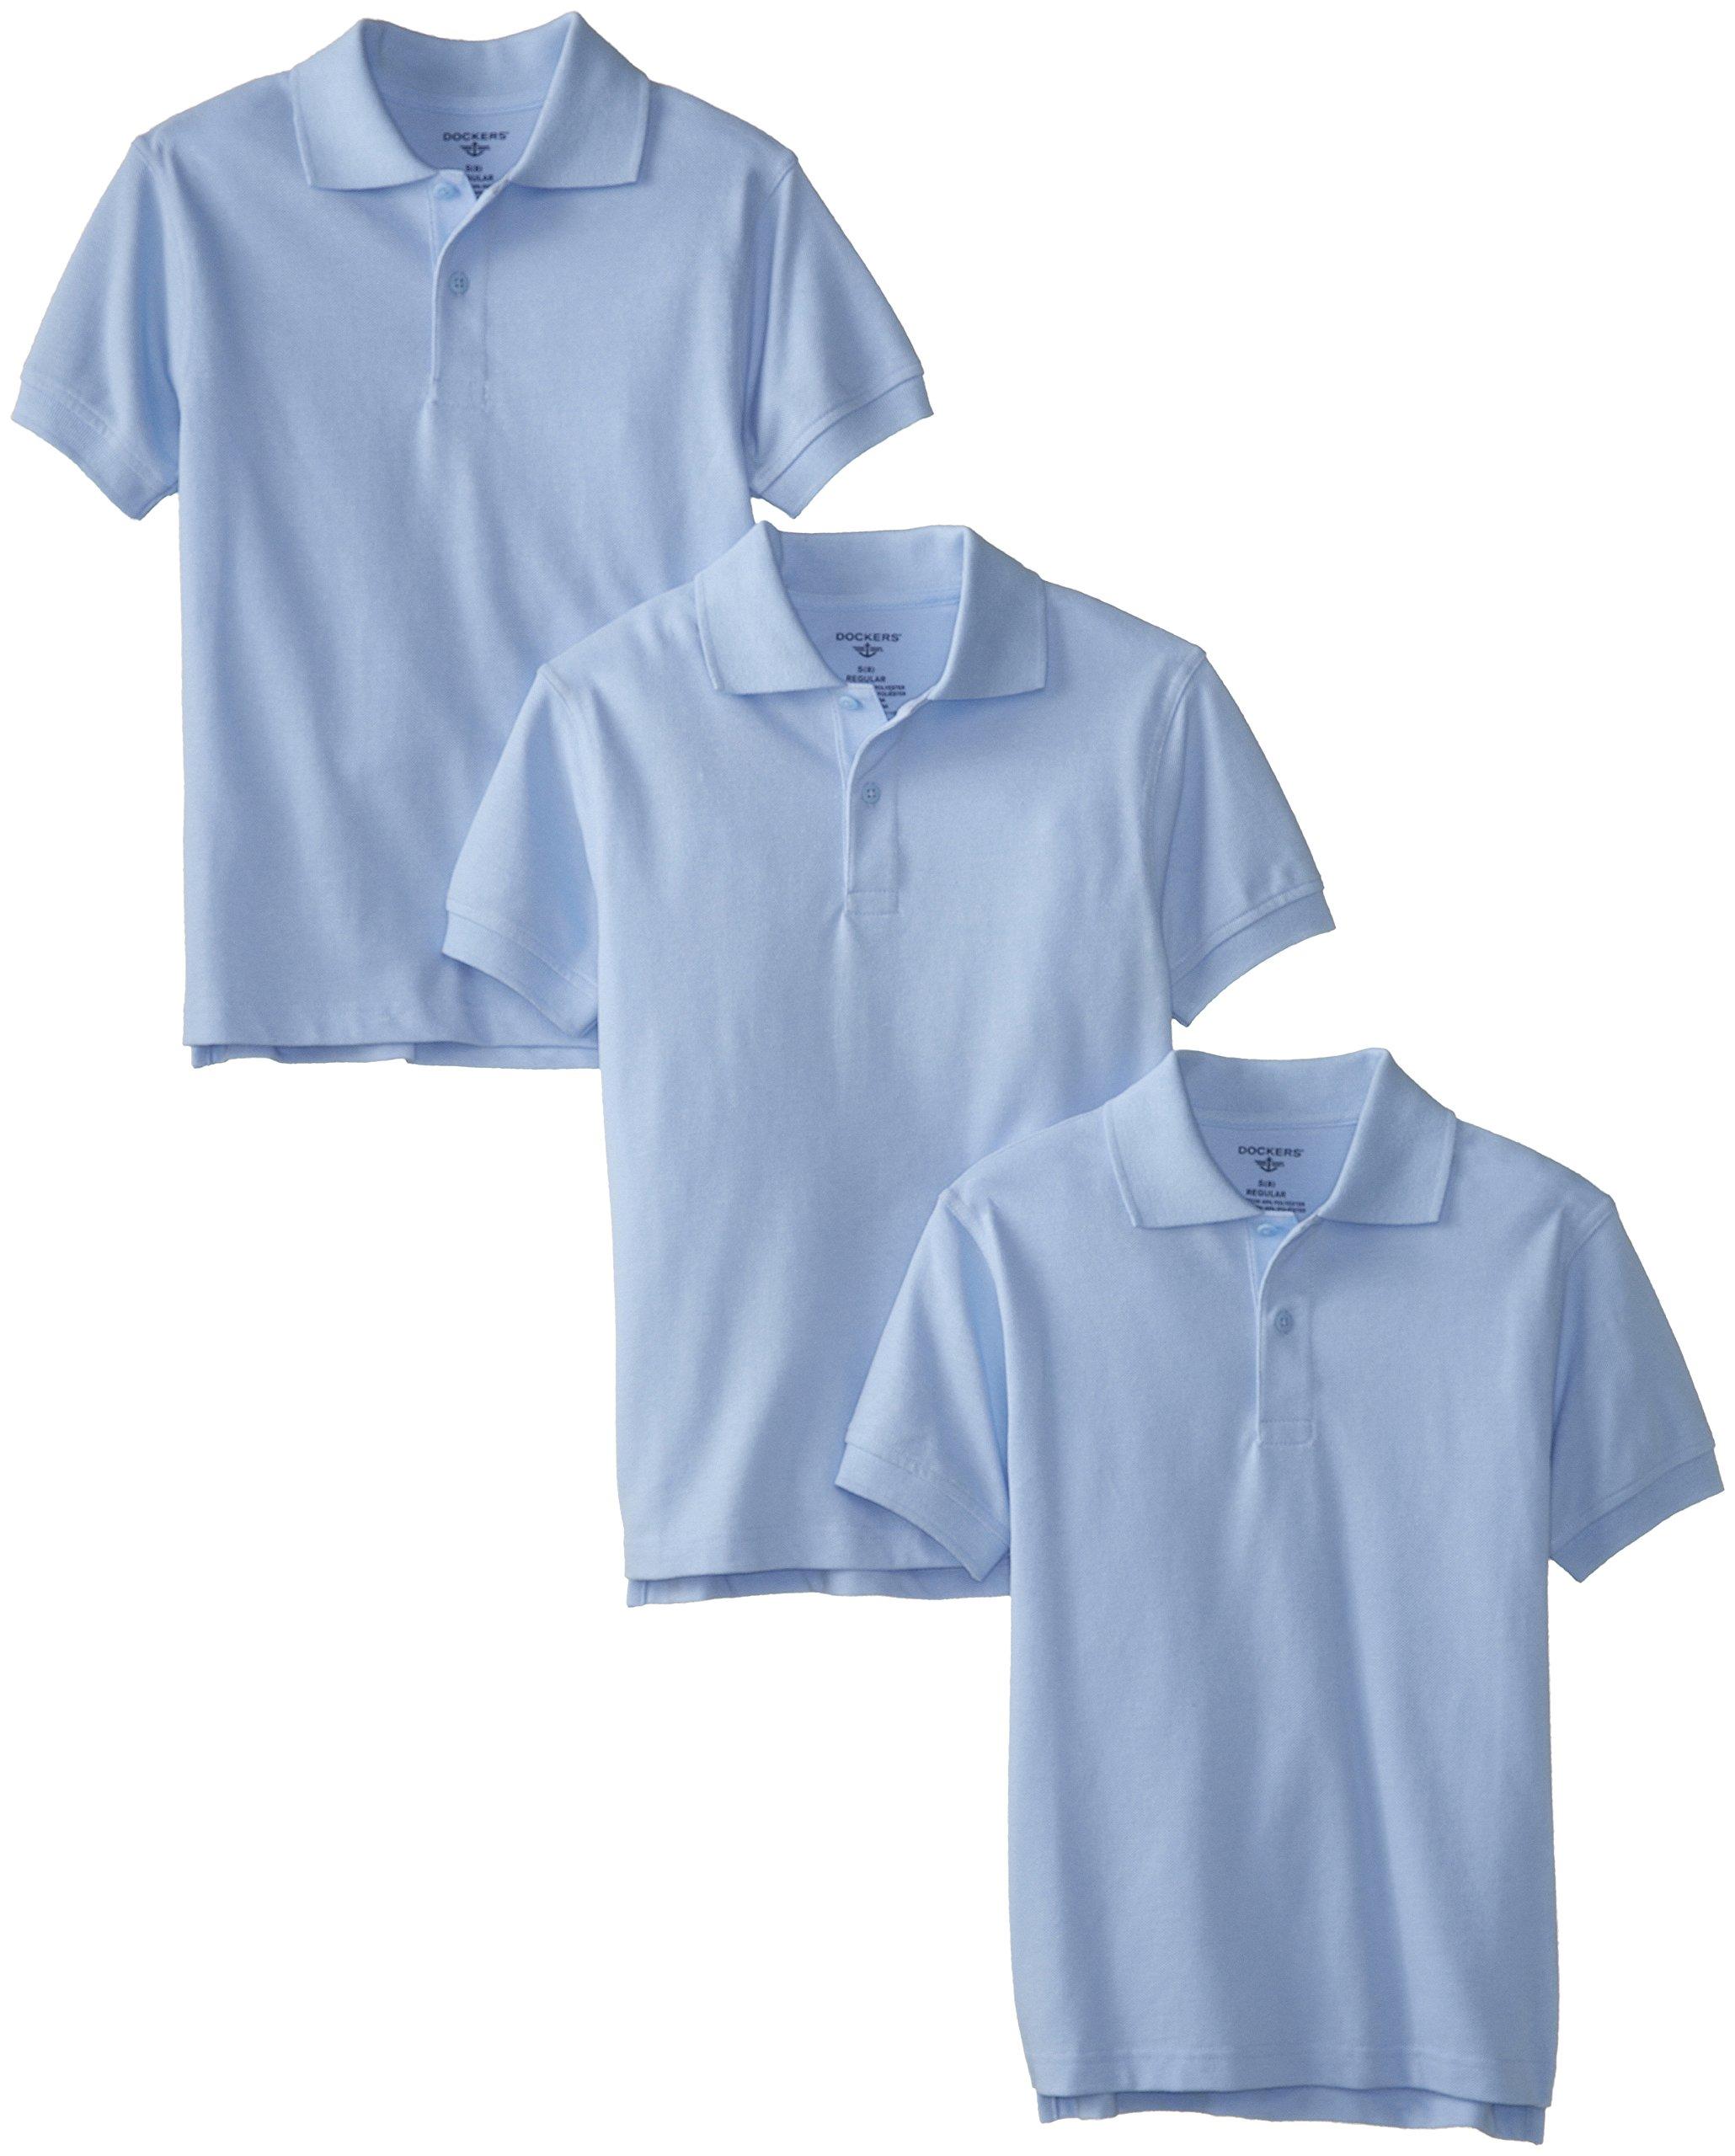 Dockers Big Boys' Uniform 3 Pack Husky Short Sleeve Pique Polo Bundle, Light Blue, X-Large/18/20